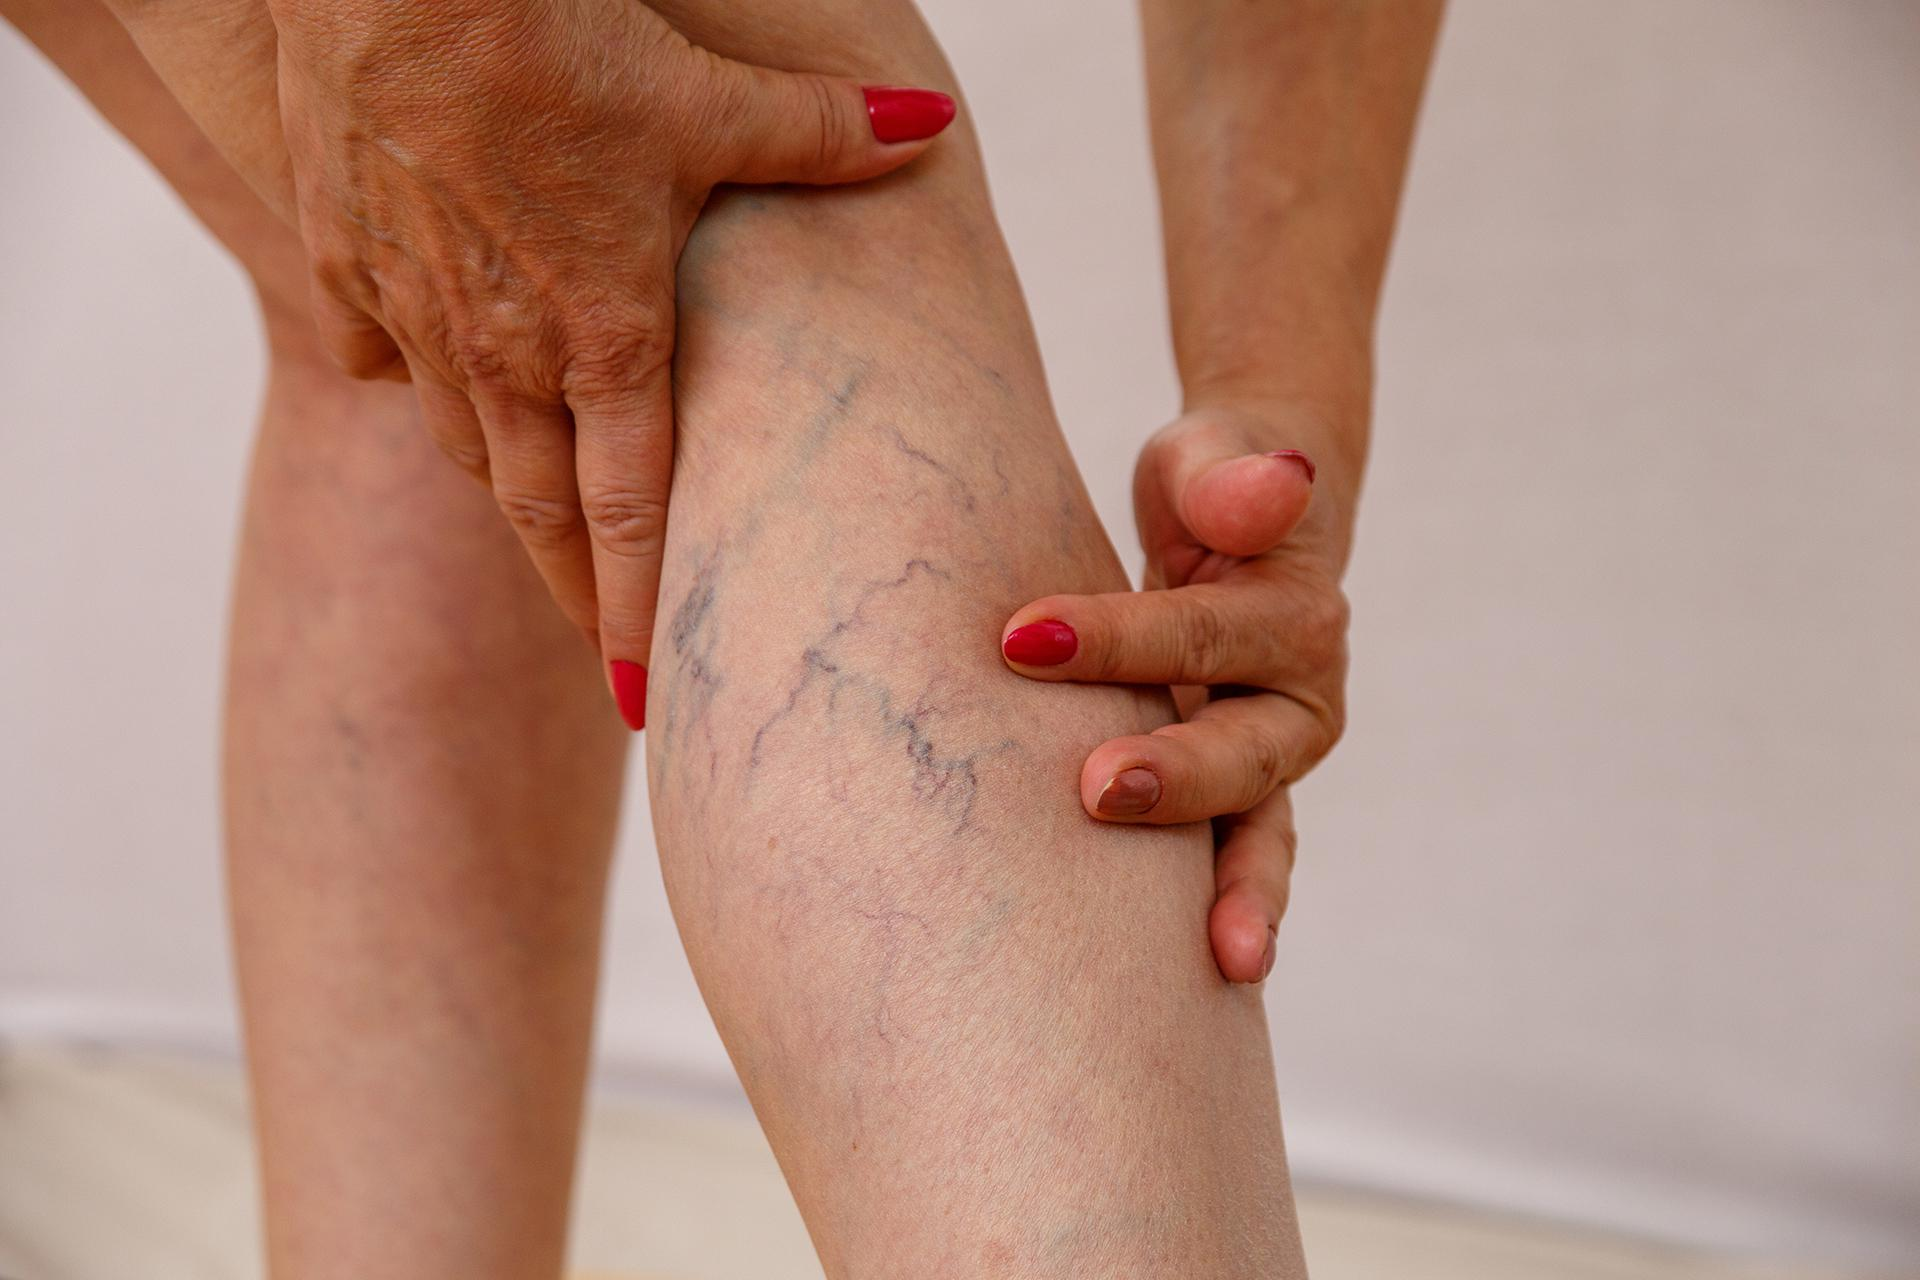 vascular-issues-requiring-leg-pain-doctor-San-Fernando